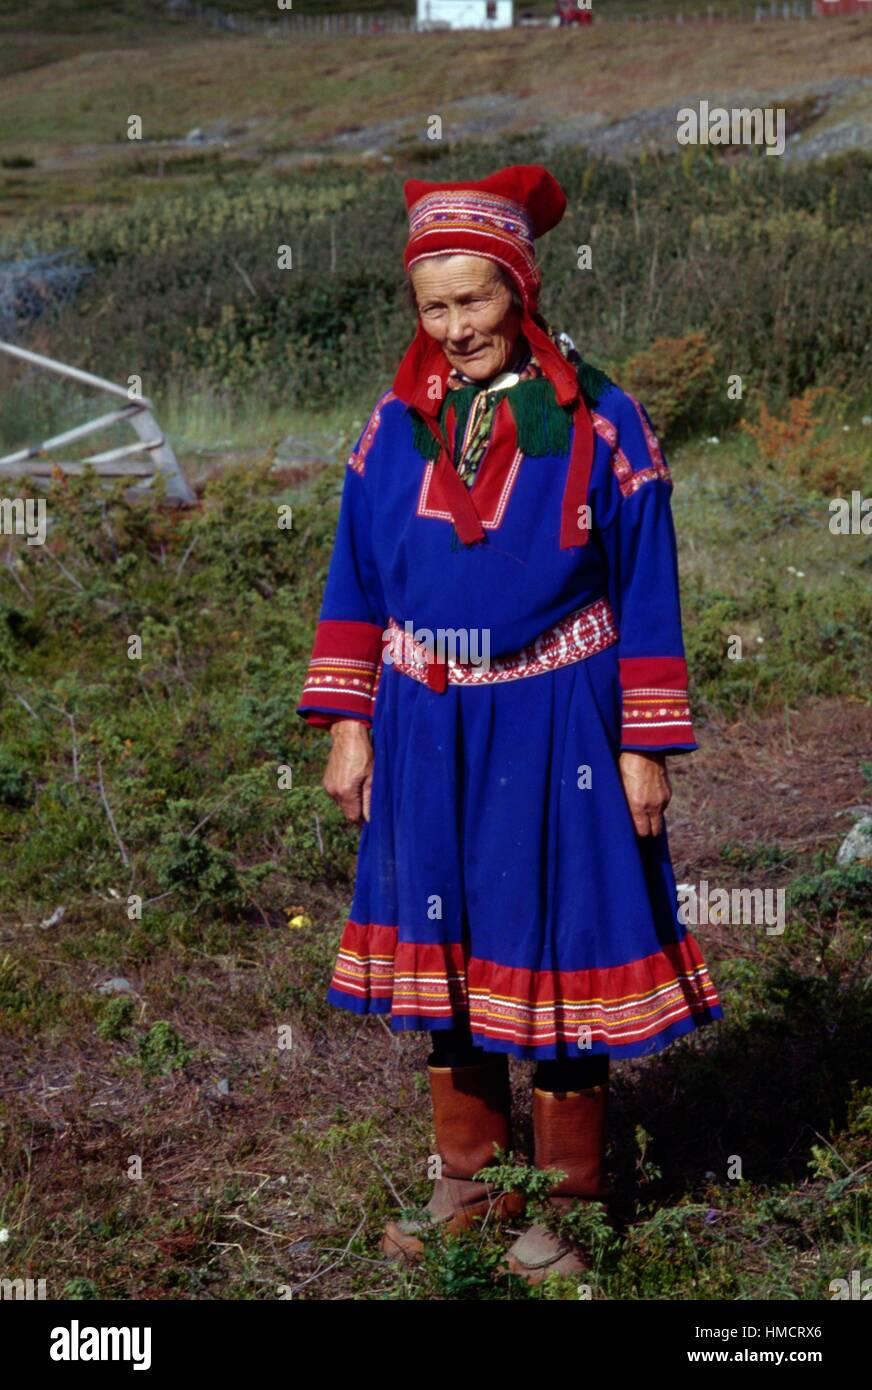 Sami (Laplander) woman wearing a traditional dress, Kautokeino, Finnmark, Lapland, Norway. - Stock Image